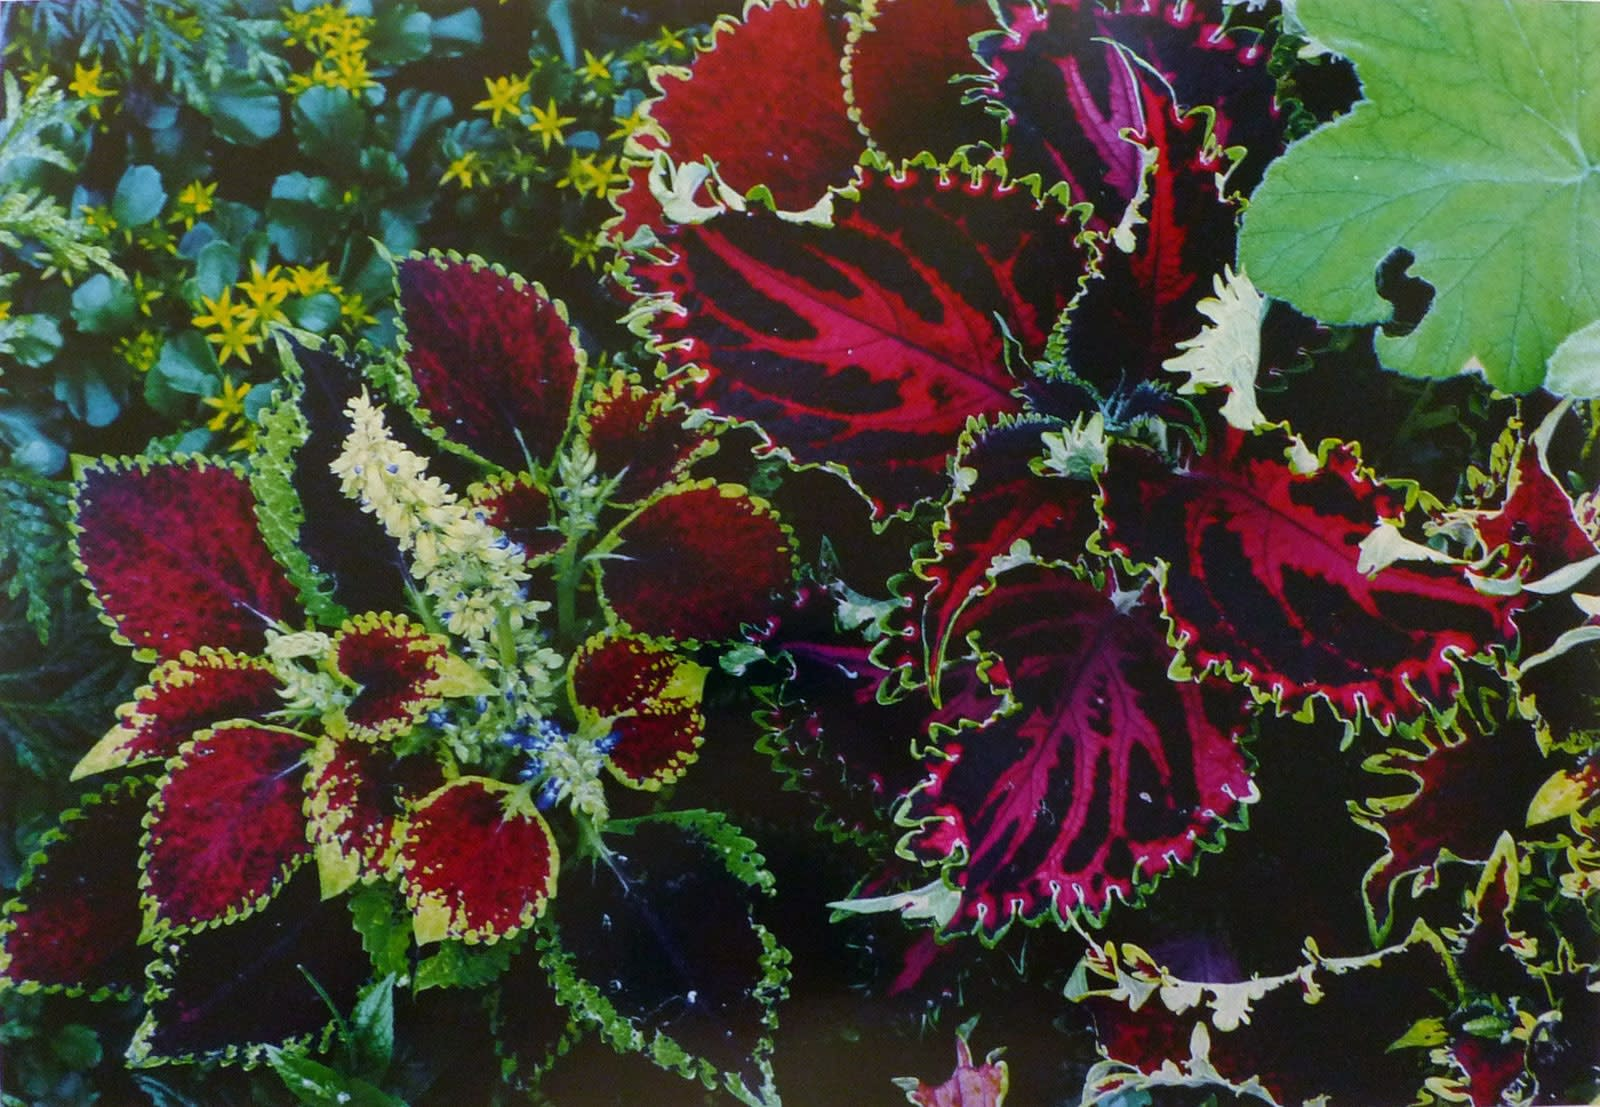 Ernst Haas, Flowers, Coleus, Rockport, Maine, 1982